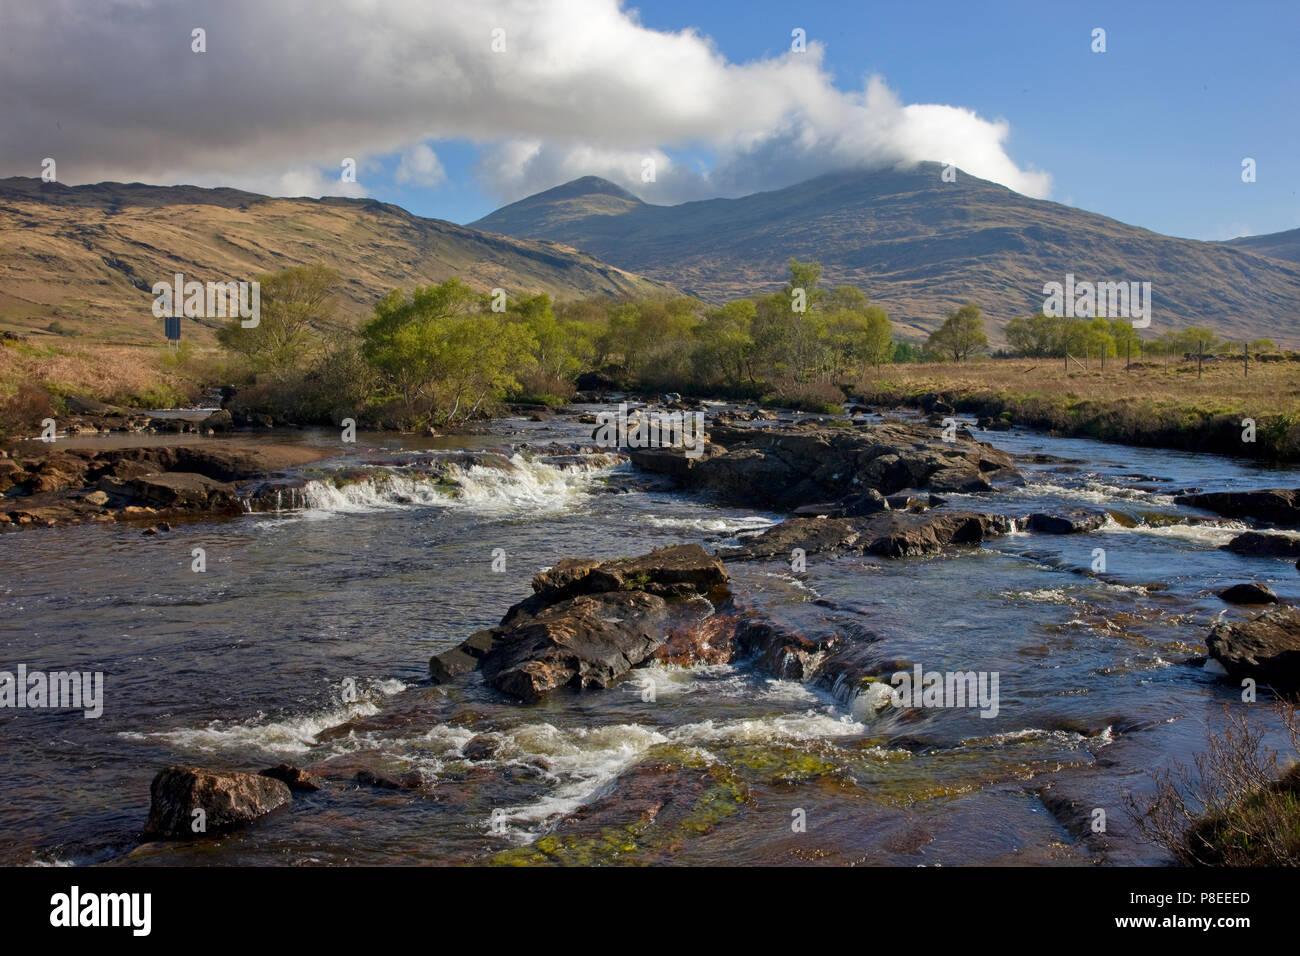 Ben More, Isle of Mull, Argyll - Stock Image